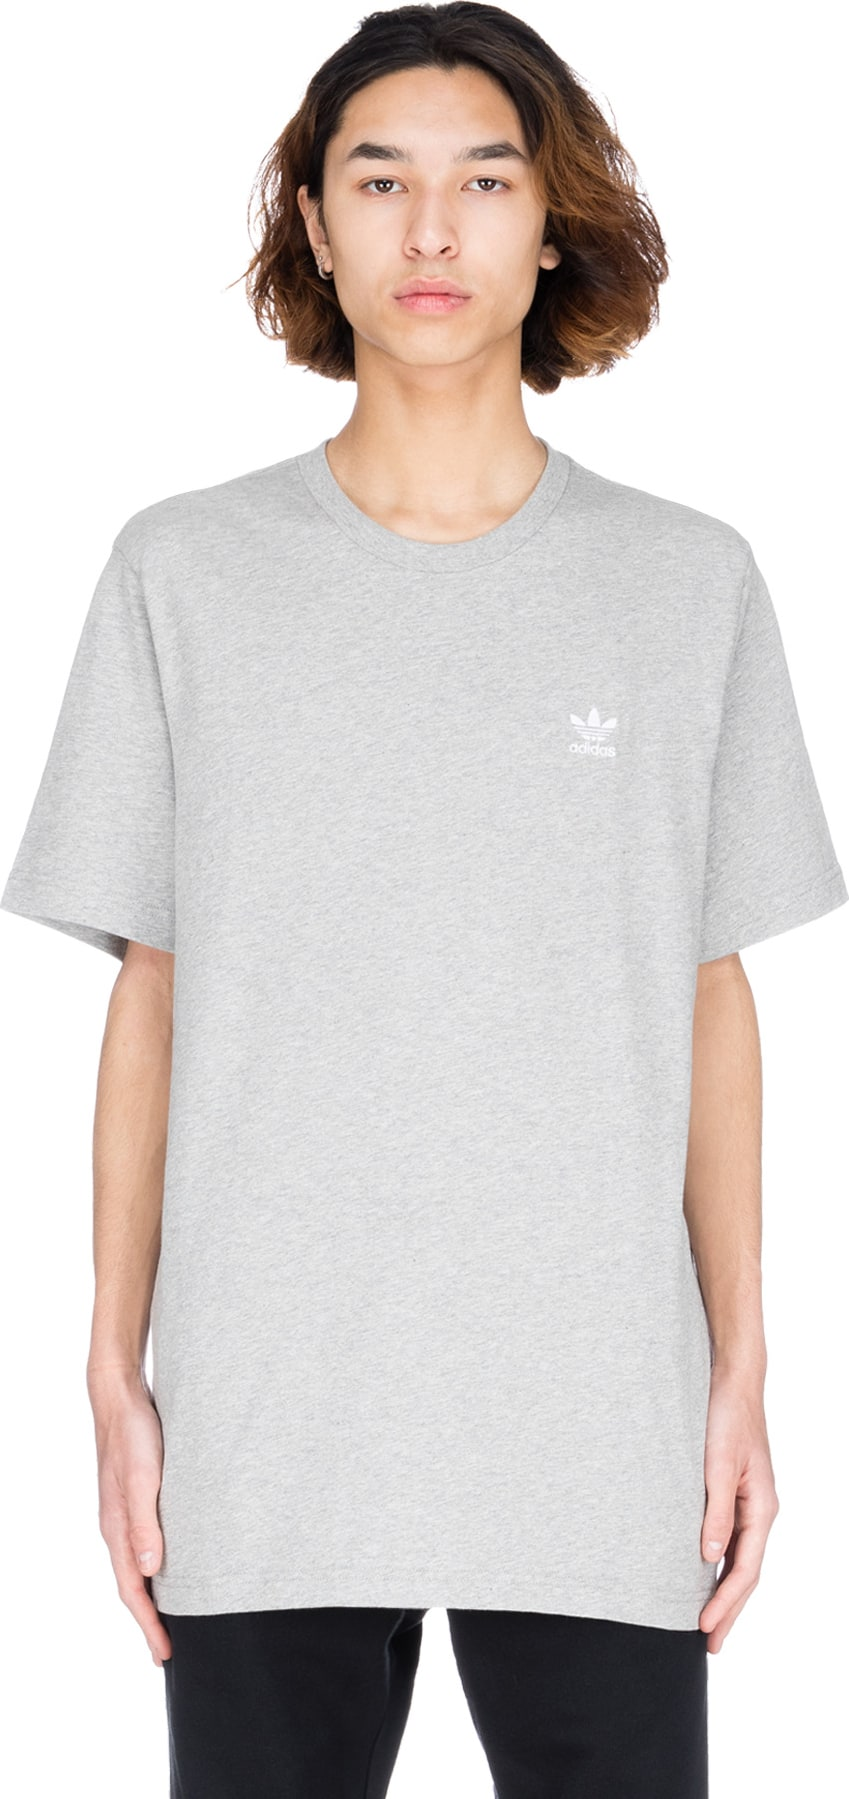 9297f6f0a adidas Originals - Essential T-Shirt - Medium Grey Heather